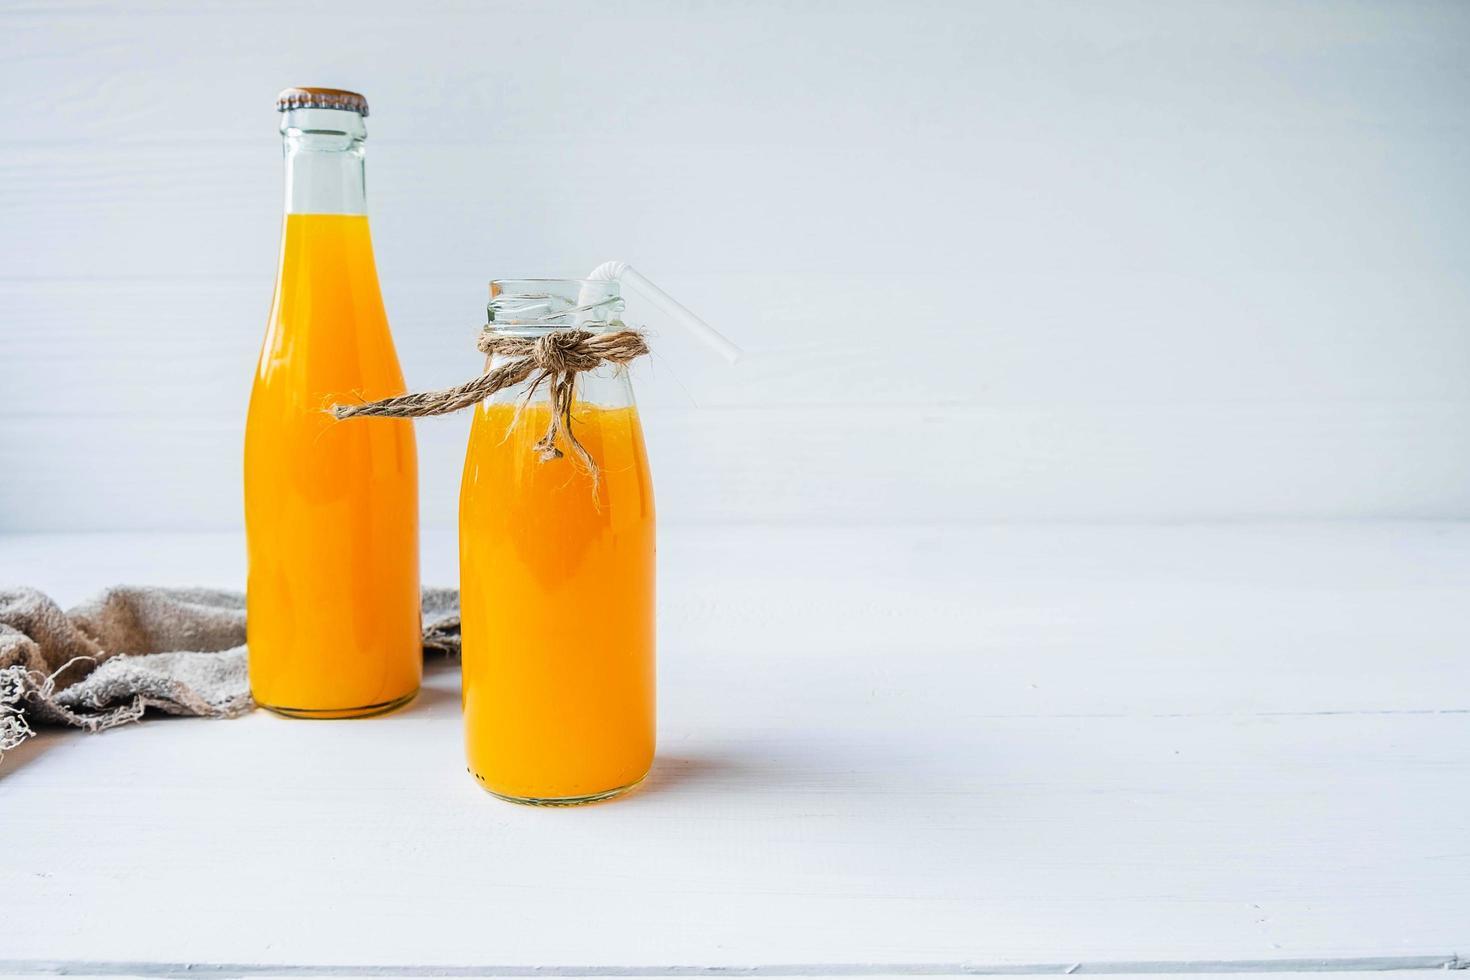 botellas de jugo de naranja foto